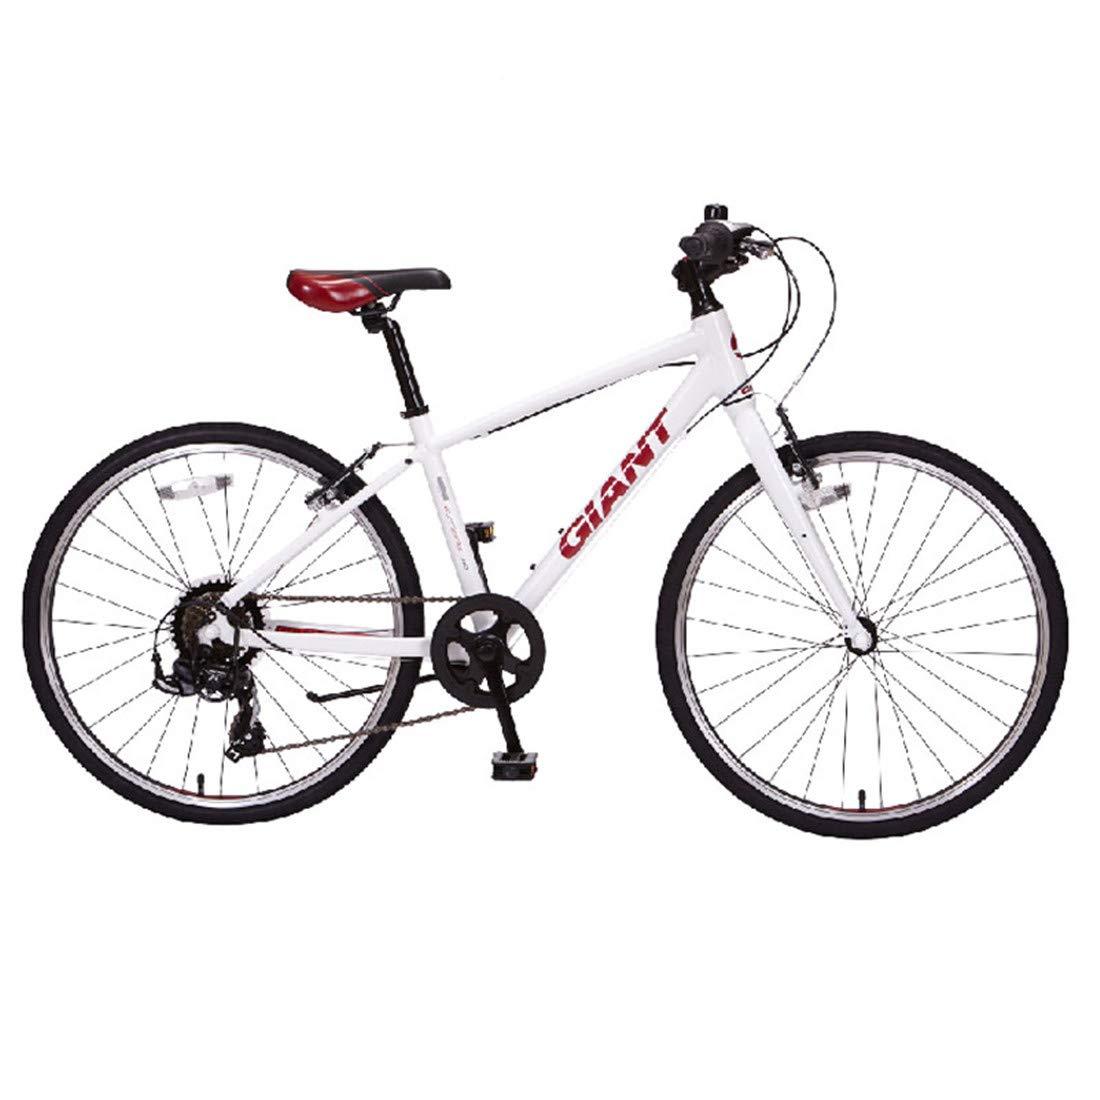 Citybike 24 Zoll 7-Gang Fahrrad Aluminiumlegierung Rahmen Für Erwachsene Mountainbike Weiß